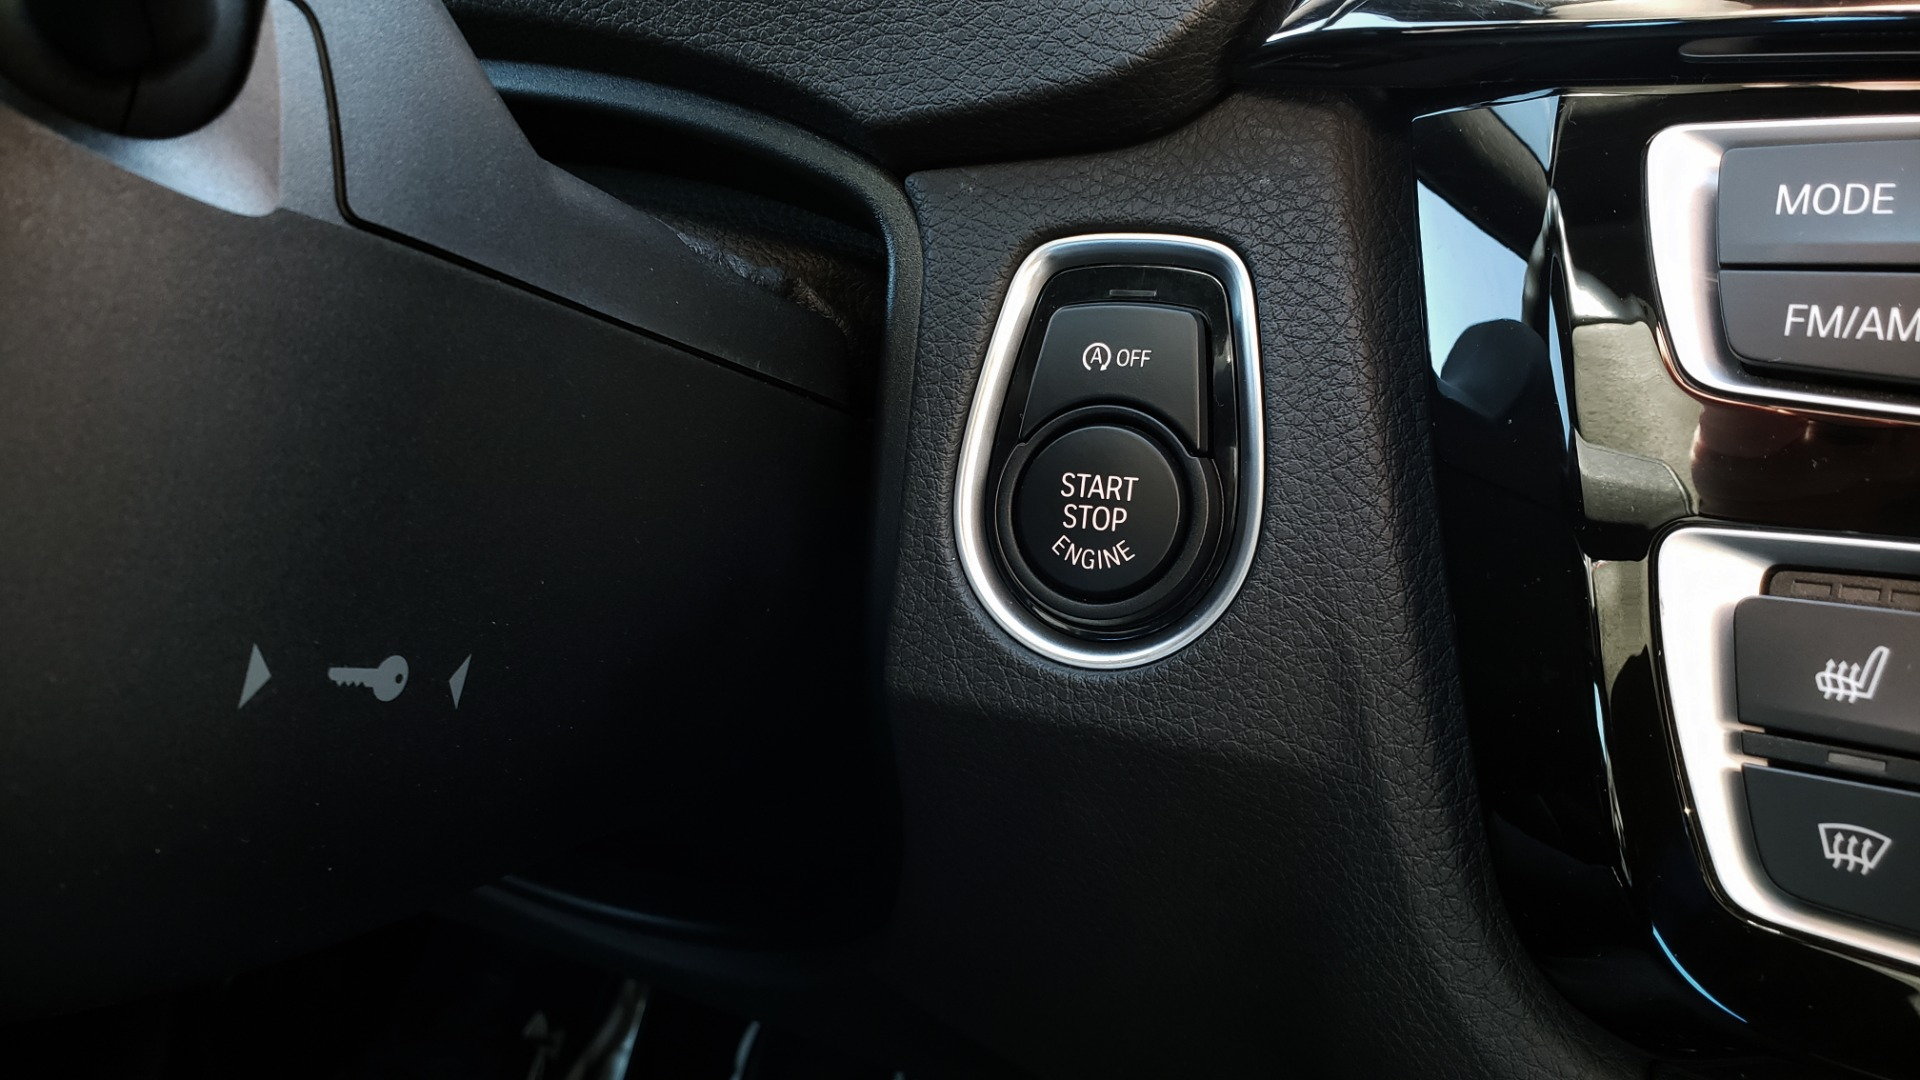 Used 2018 BMW M4 COMP PKG / EXEC / M-DRIVER / PARK CNTRL / ACTIVE BLIND SPOT for sale $45,449 at Formula Imports in Charlotte NC 28227 46